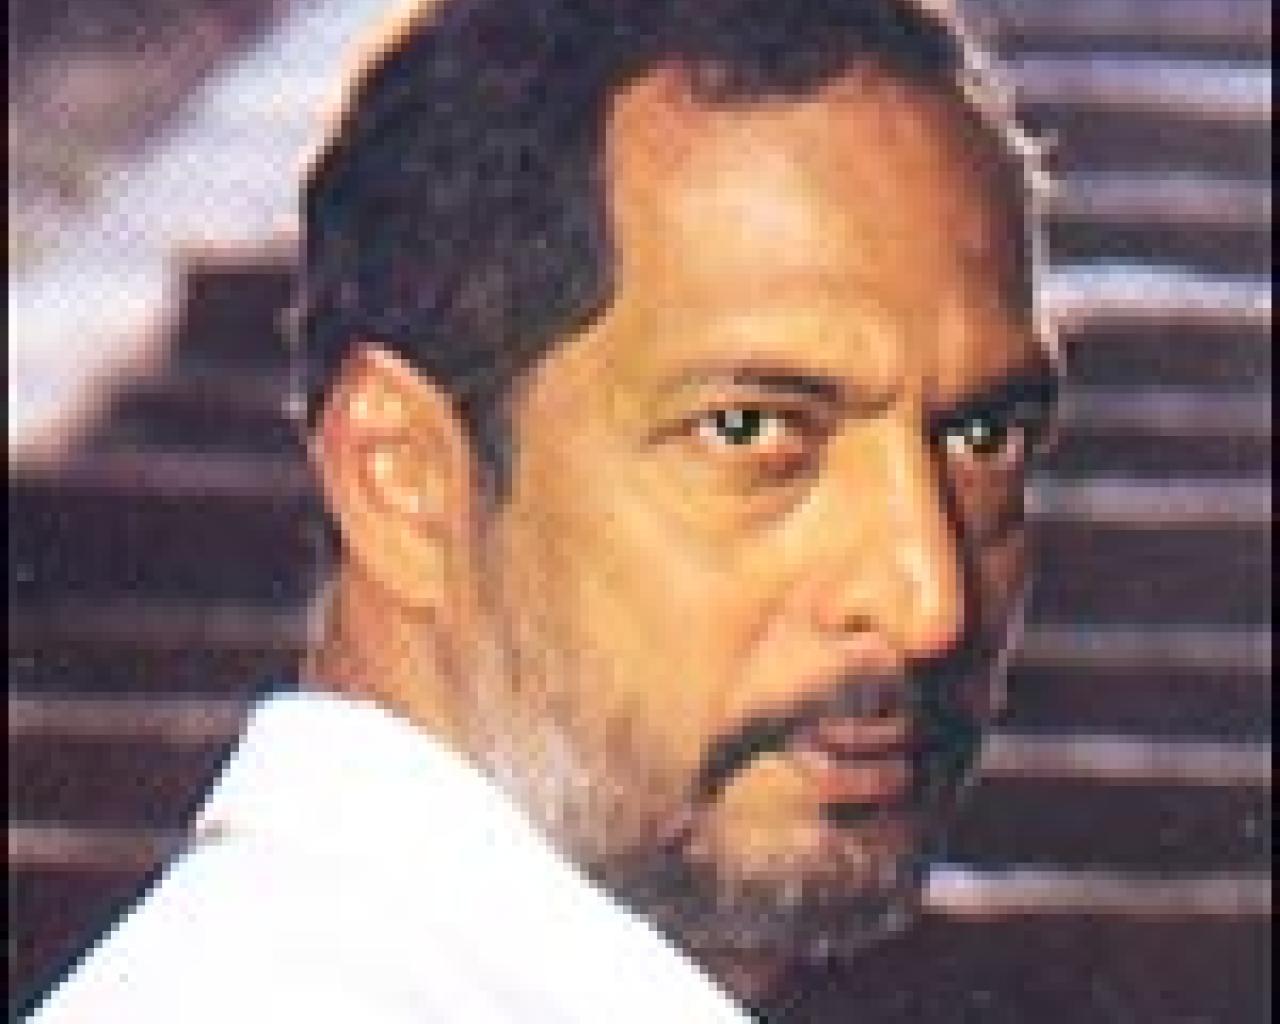 Nana Patekar Movies List Actress Stills